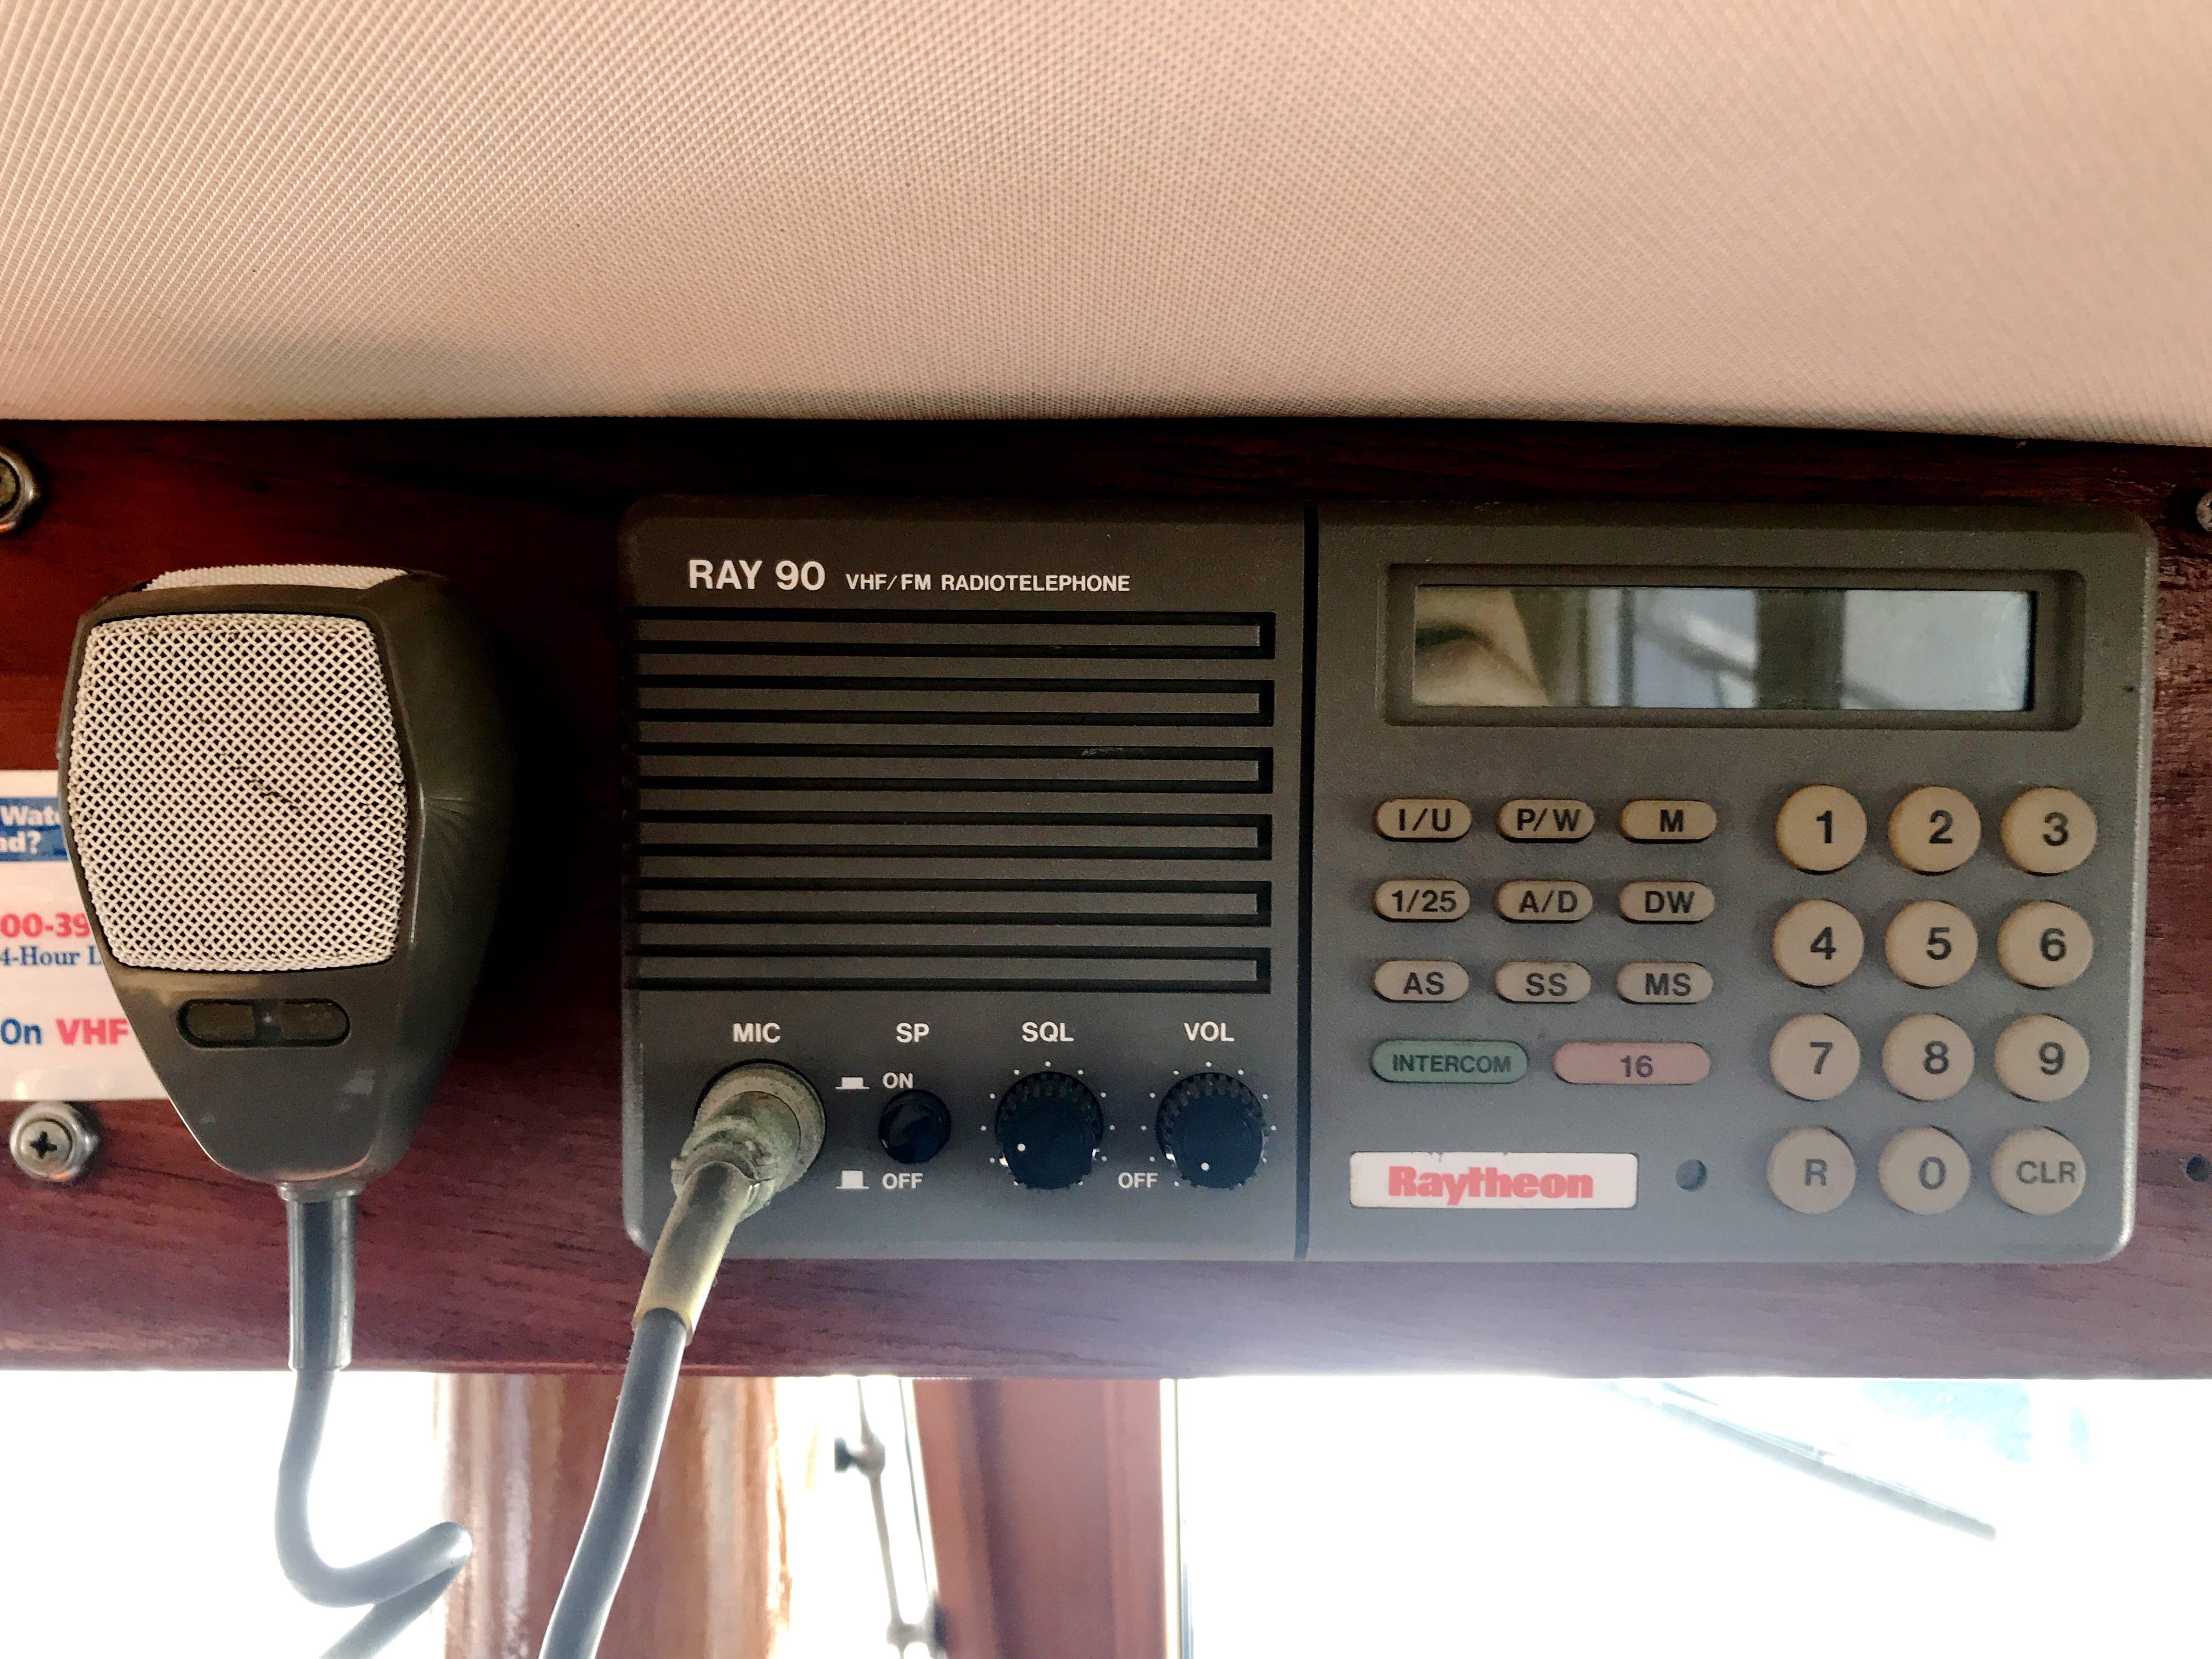 Sea Ranger SUNDECK - Ray 90 VHF